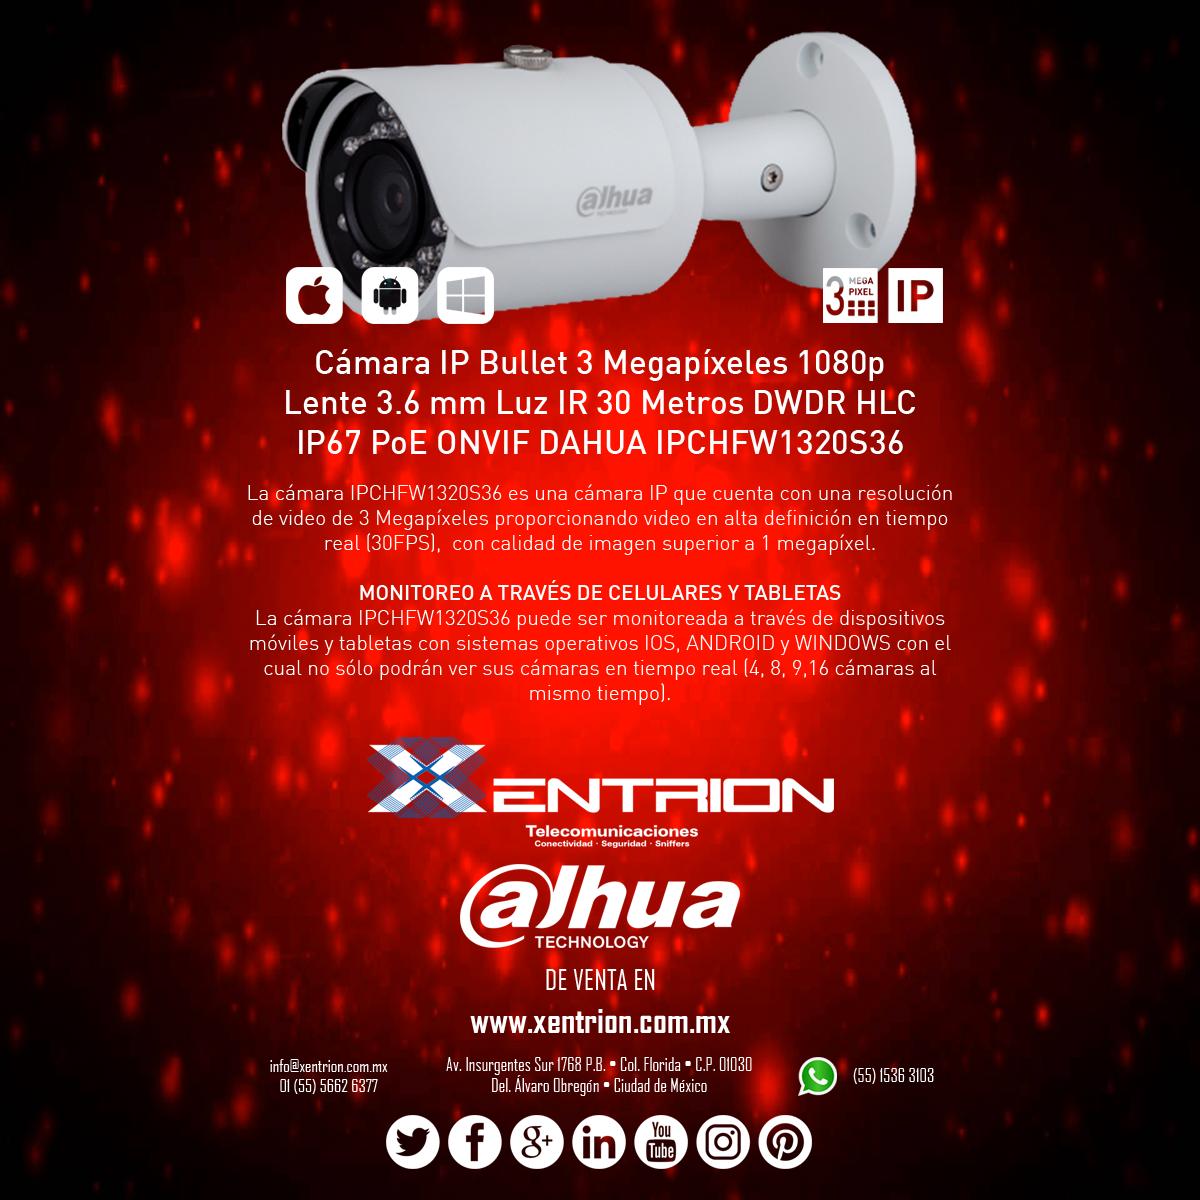 UnaVozUnaFuerza una Cámara Dahua Technology Co. LTD una